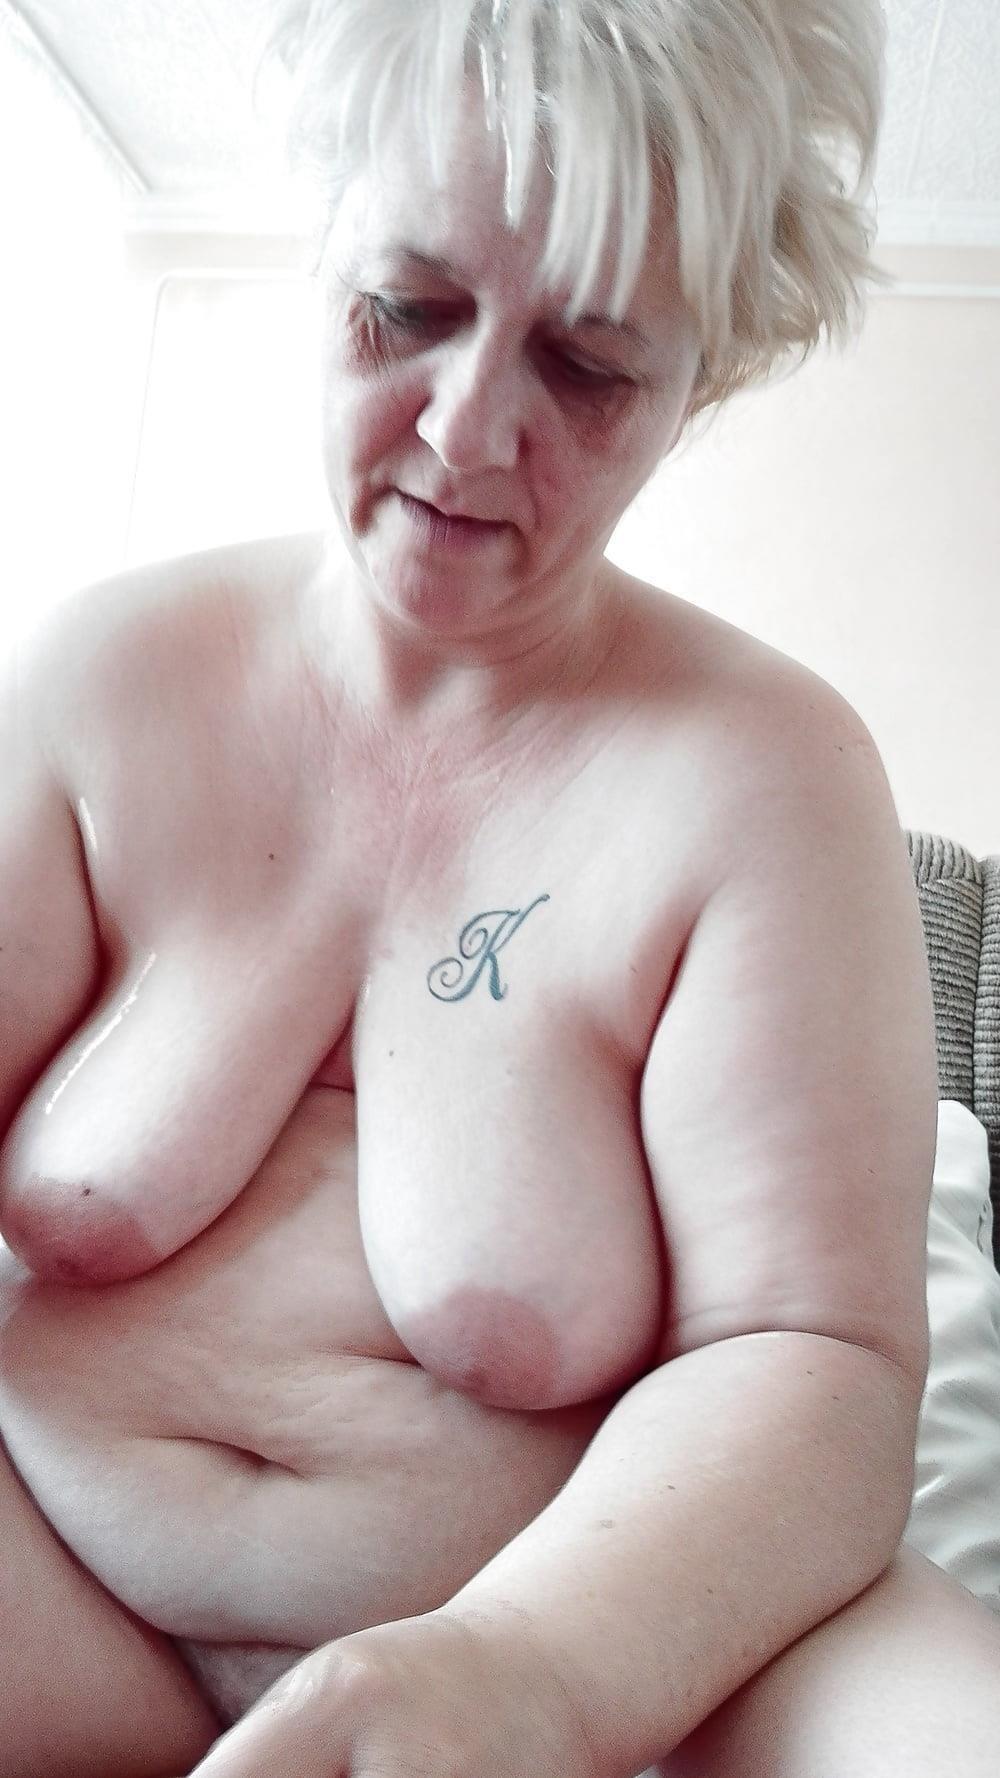 Big tits creampie pics-1243